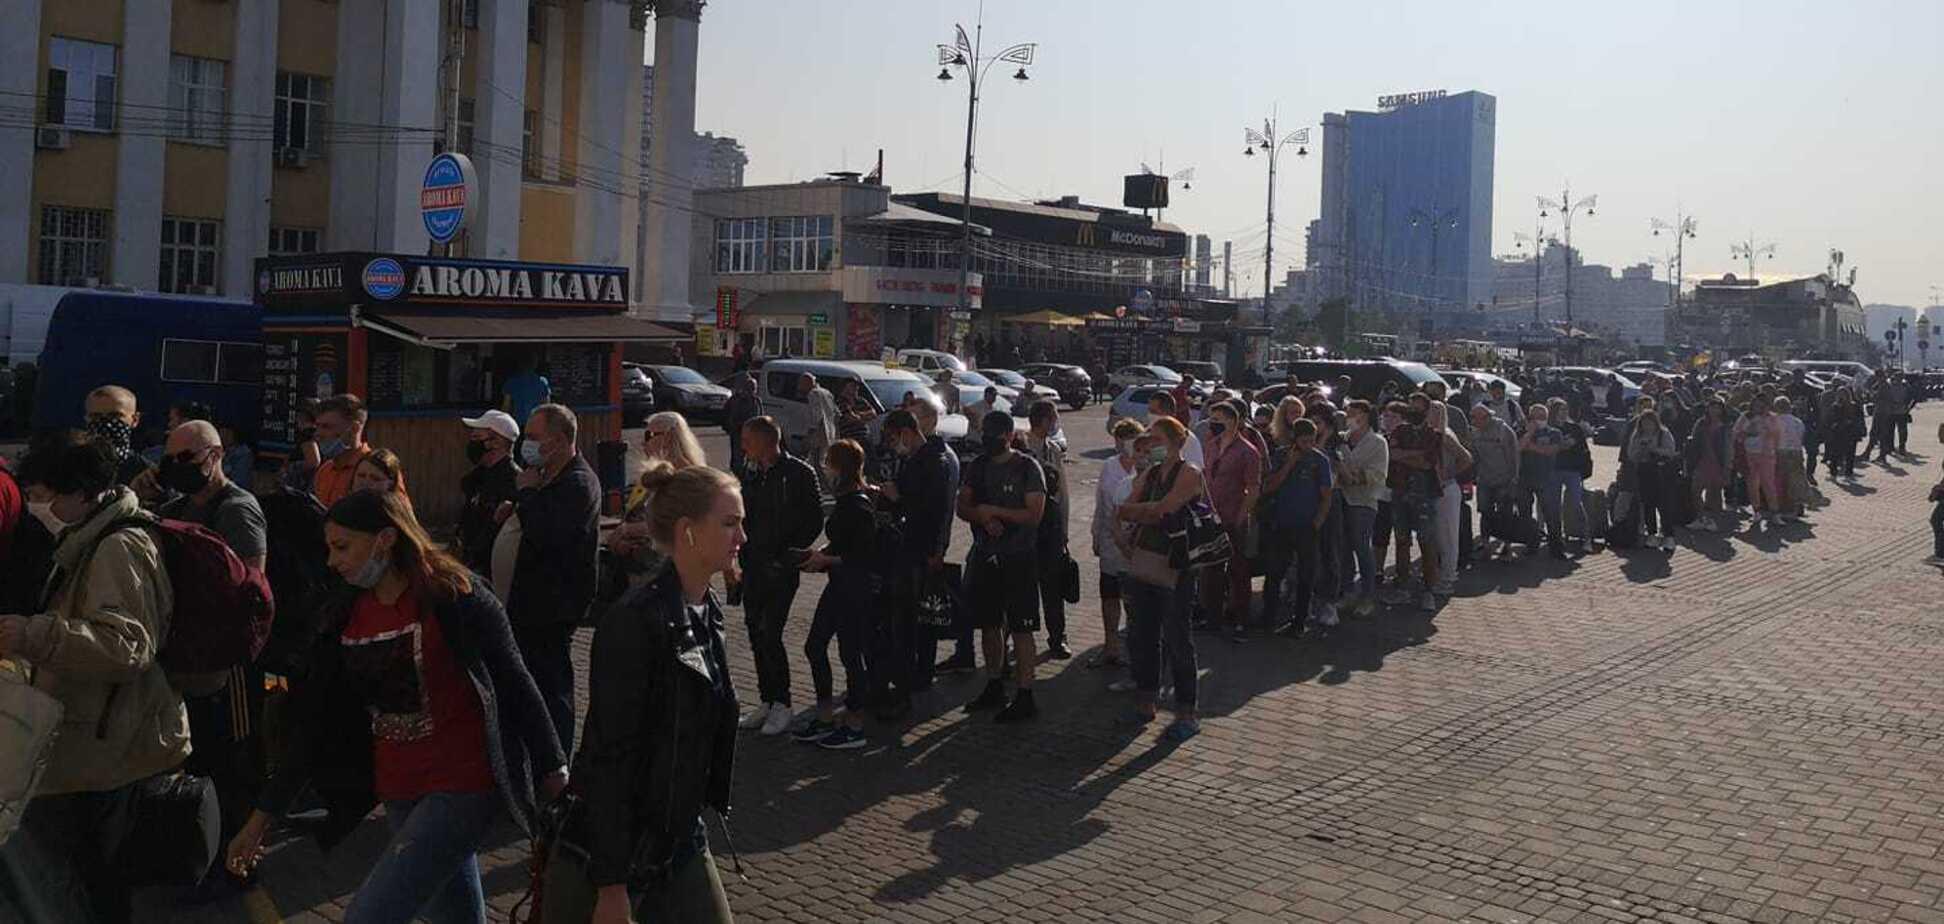 Черга на метро в Києві. Джерело: Олександр Рудоманов у Facebook